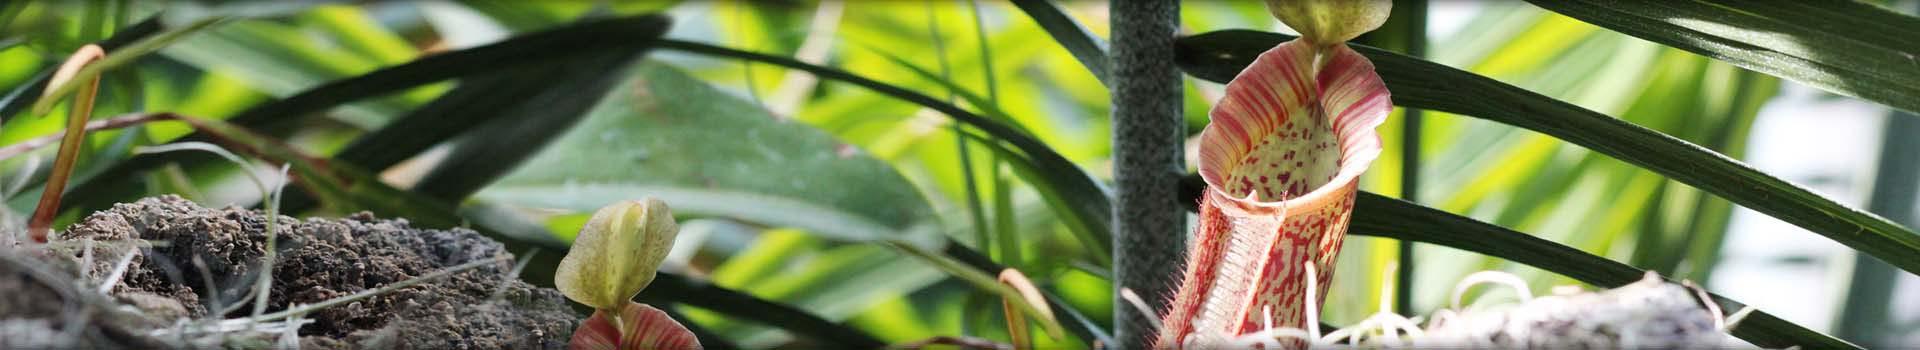 Shop Tropical Pitcher Plants (Nepenthes)